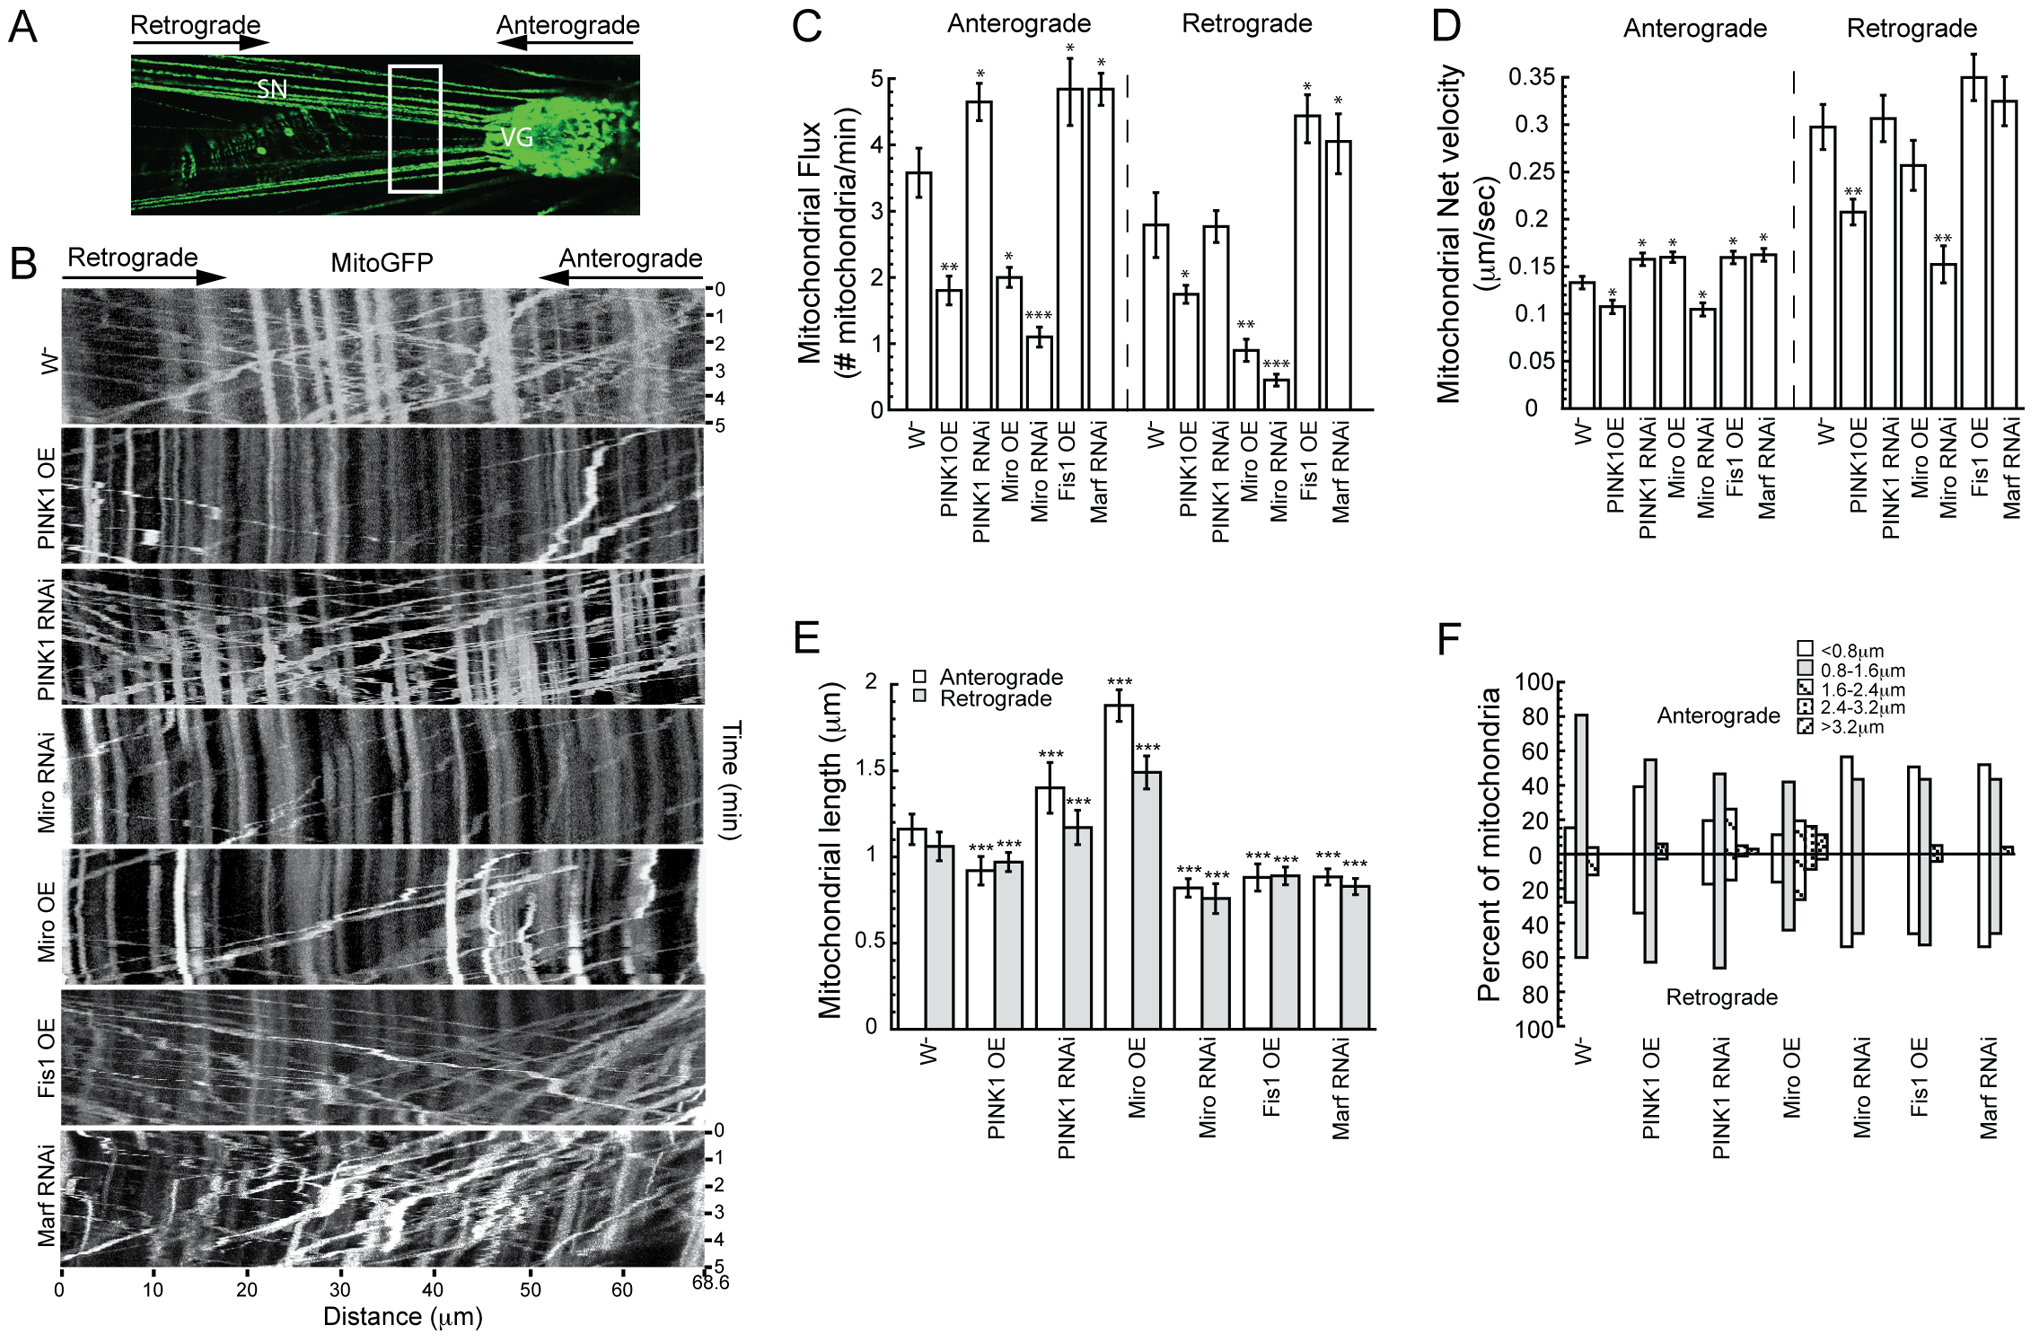 PINK1 regulates mitochondrial motility in <i>Drosophila</i> larval motor neurons.